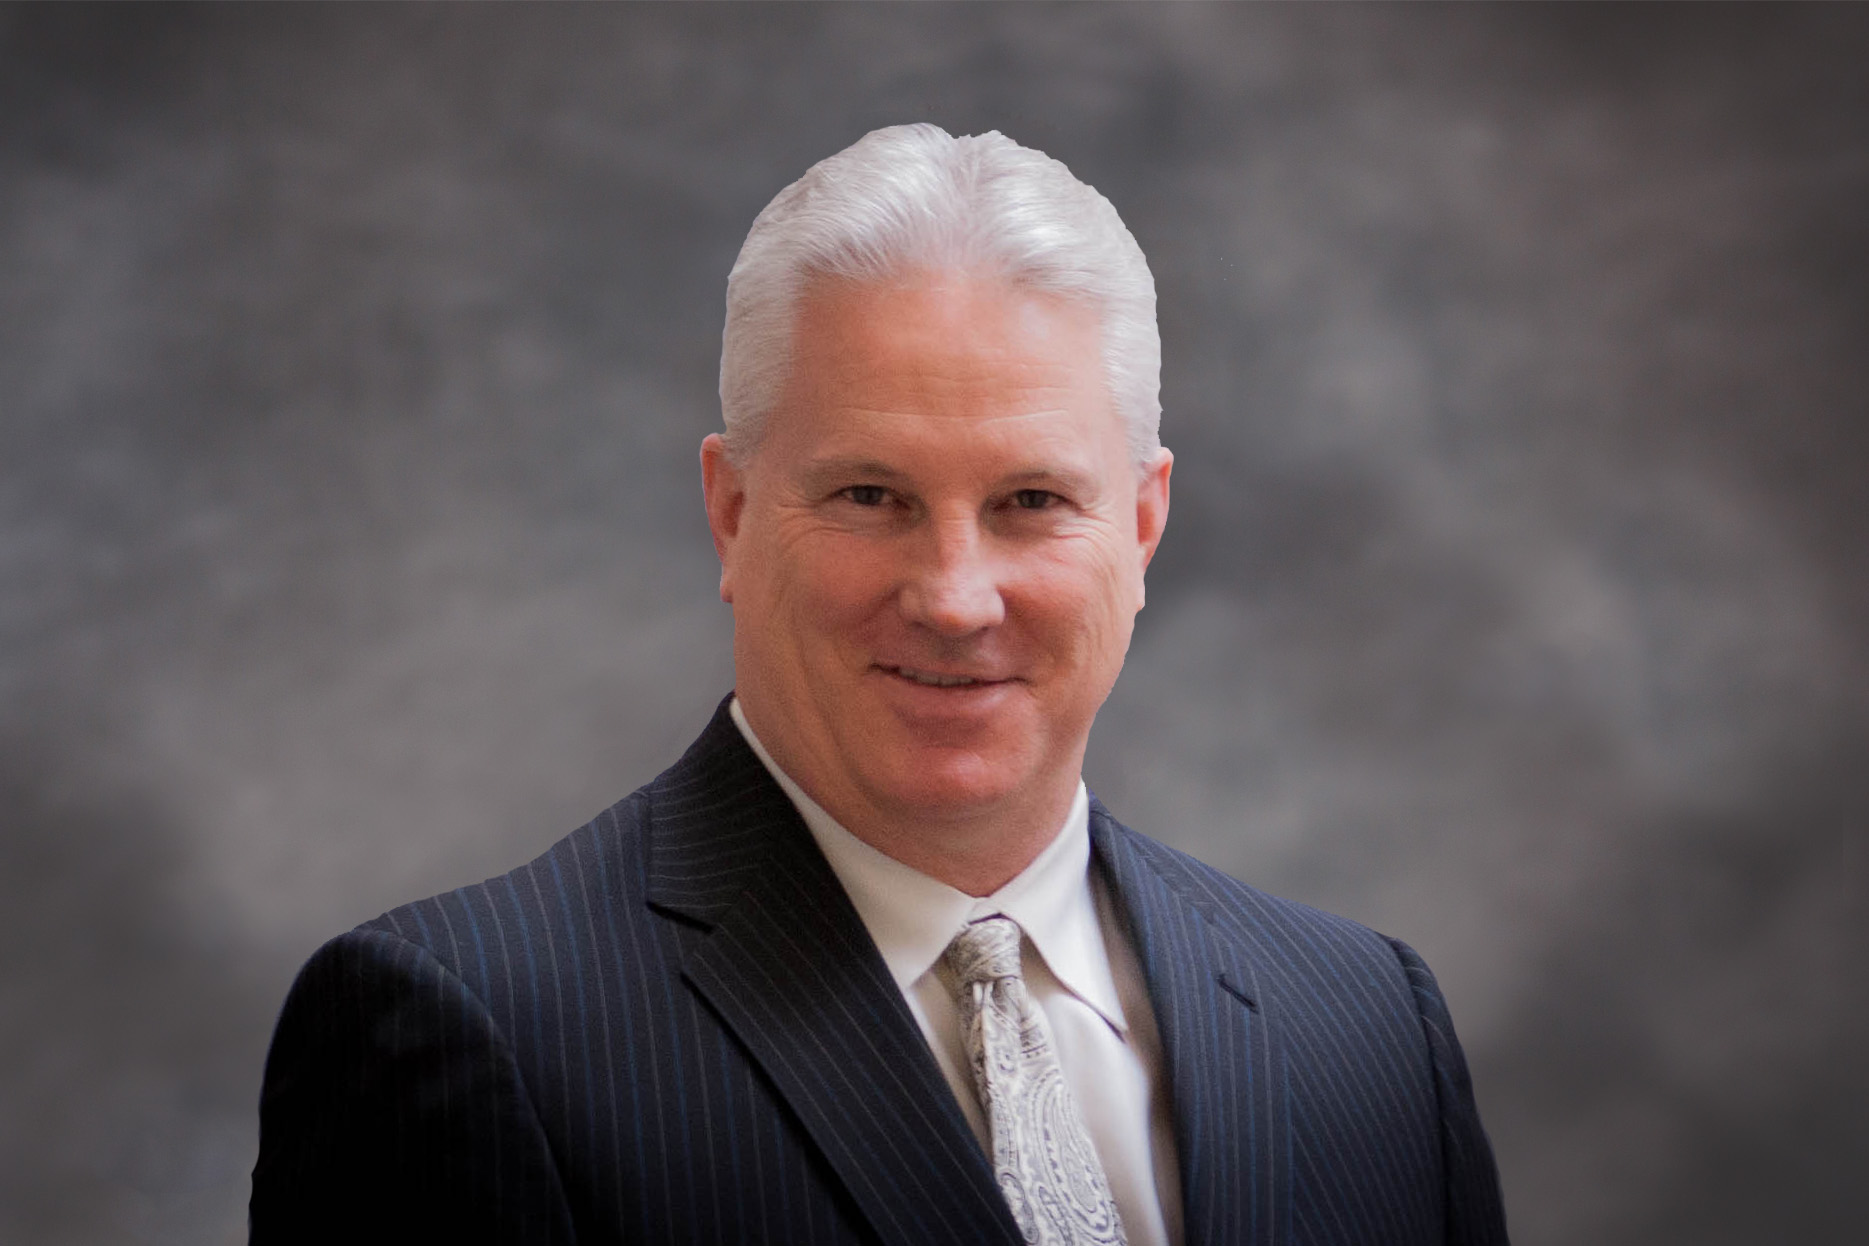 Doug Makosy